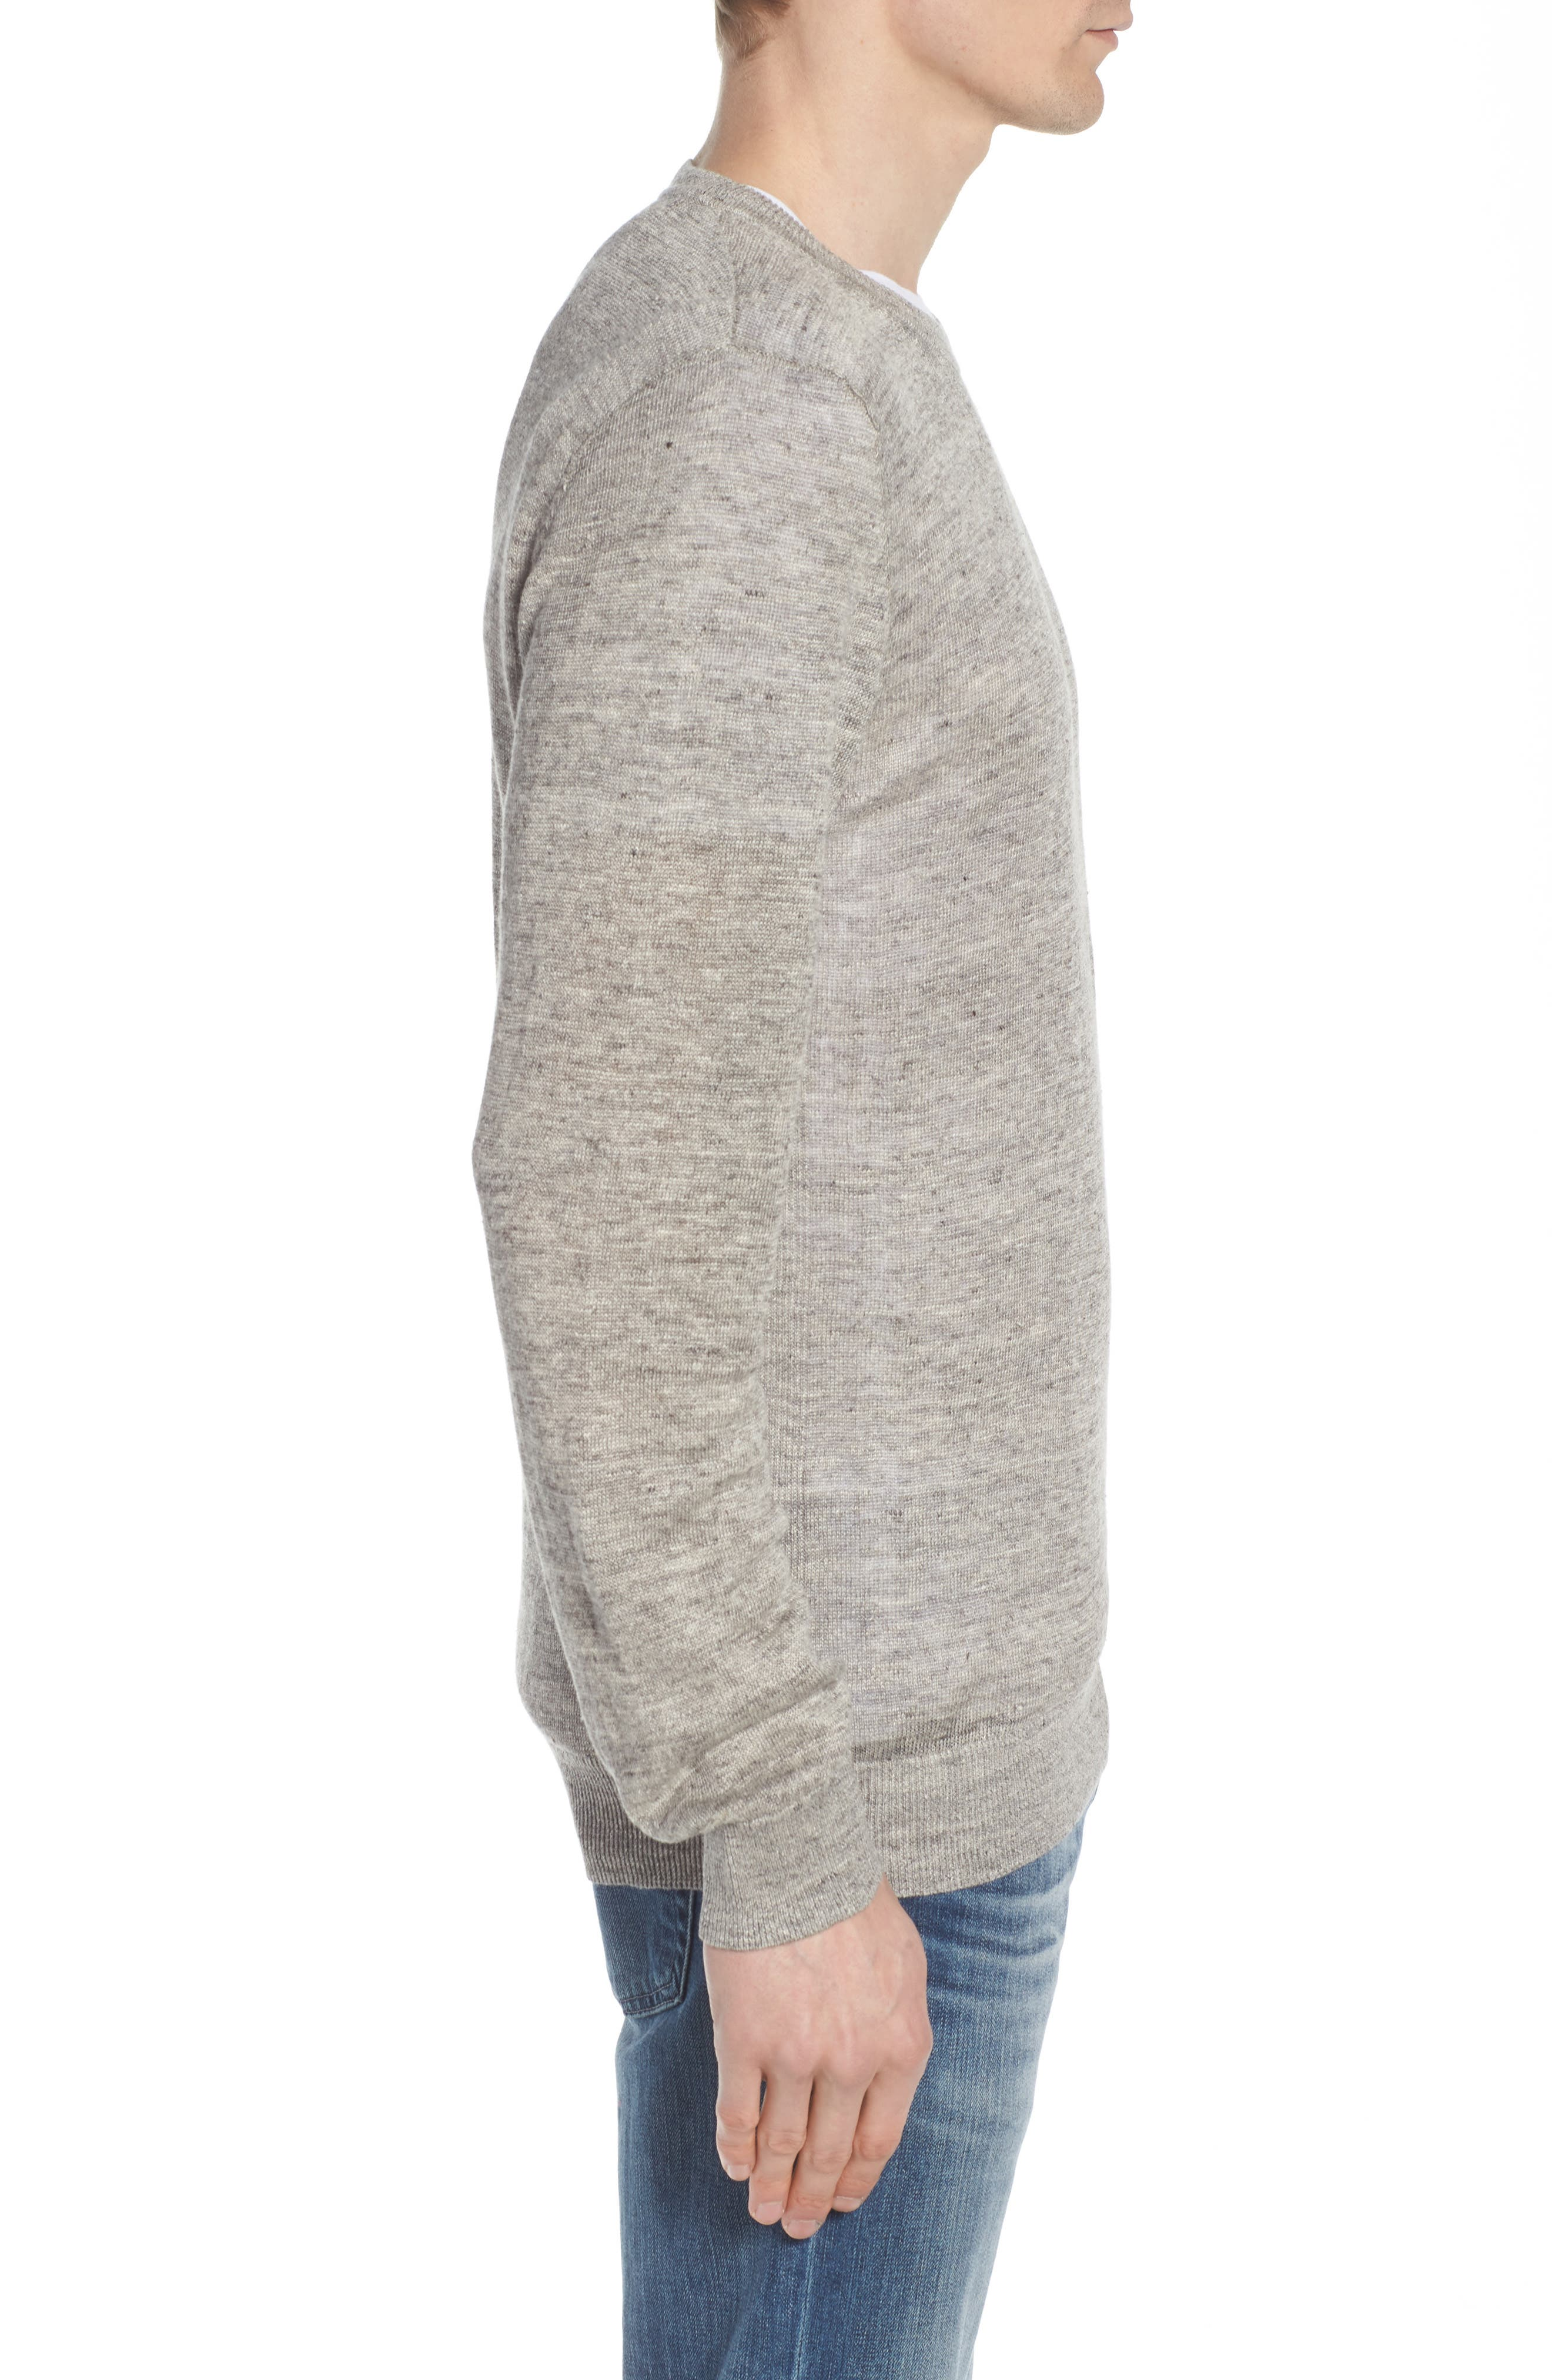 Heyward Long Sleeve T-Shirt,                             Alternate thumbnail 3, color,                             022